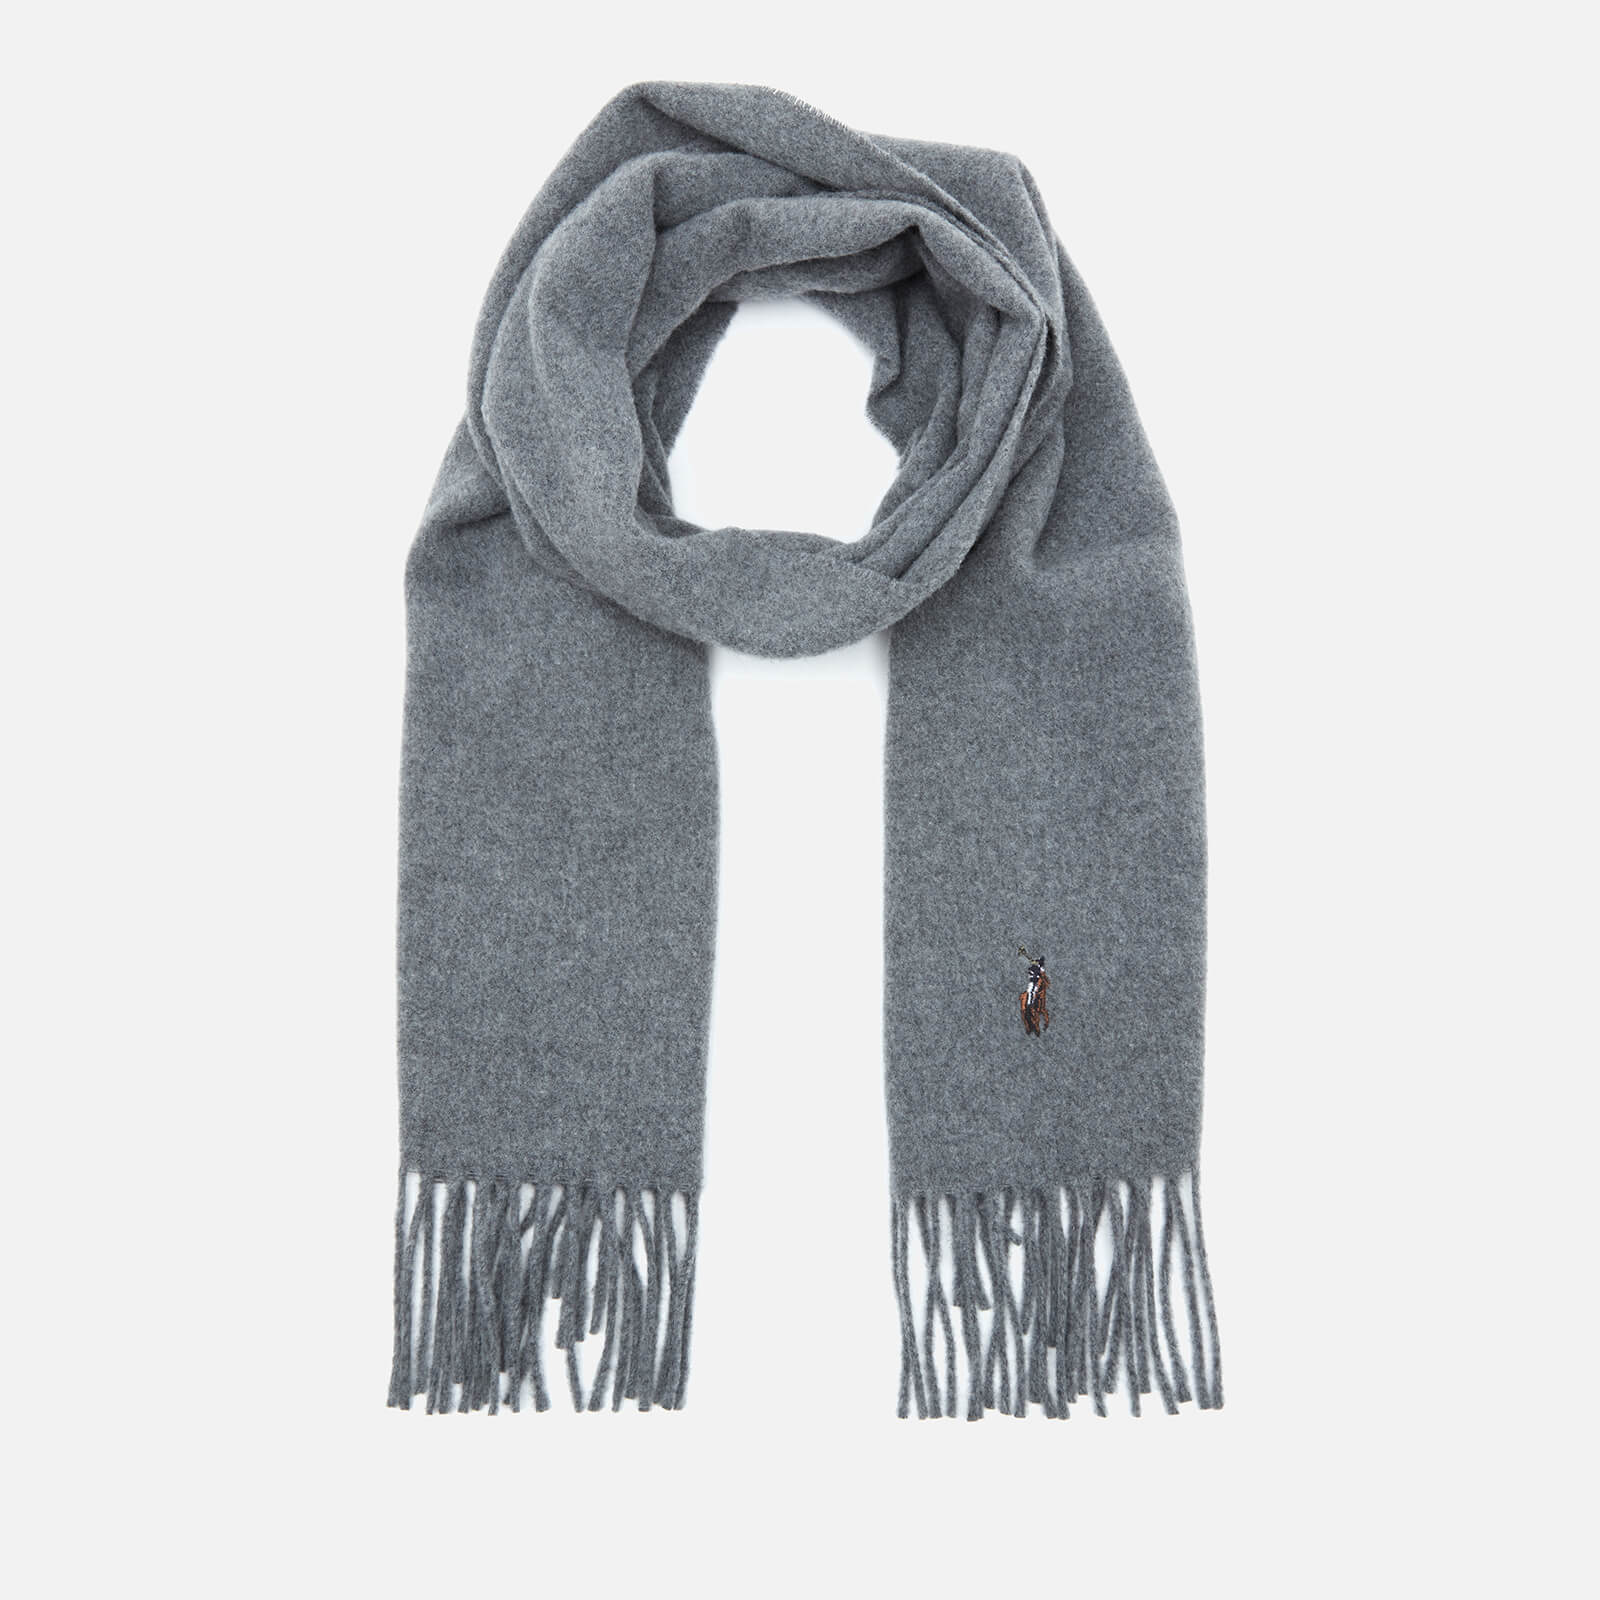 Polo Ralph Lauren Men's Fringed Virgin Wool Scarf - Fawn Grey Heather